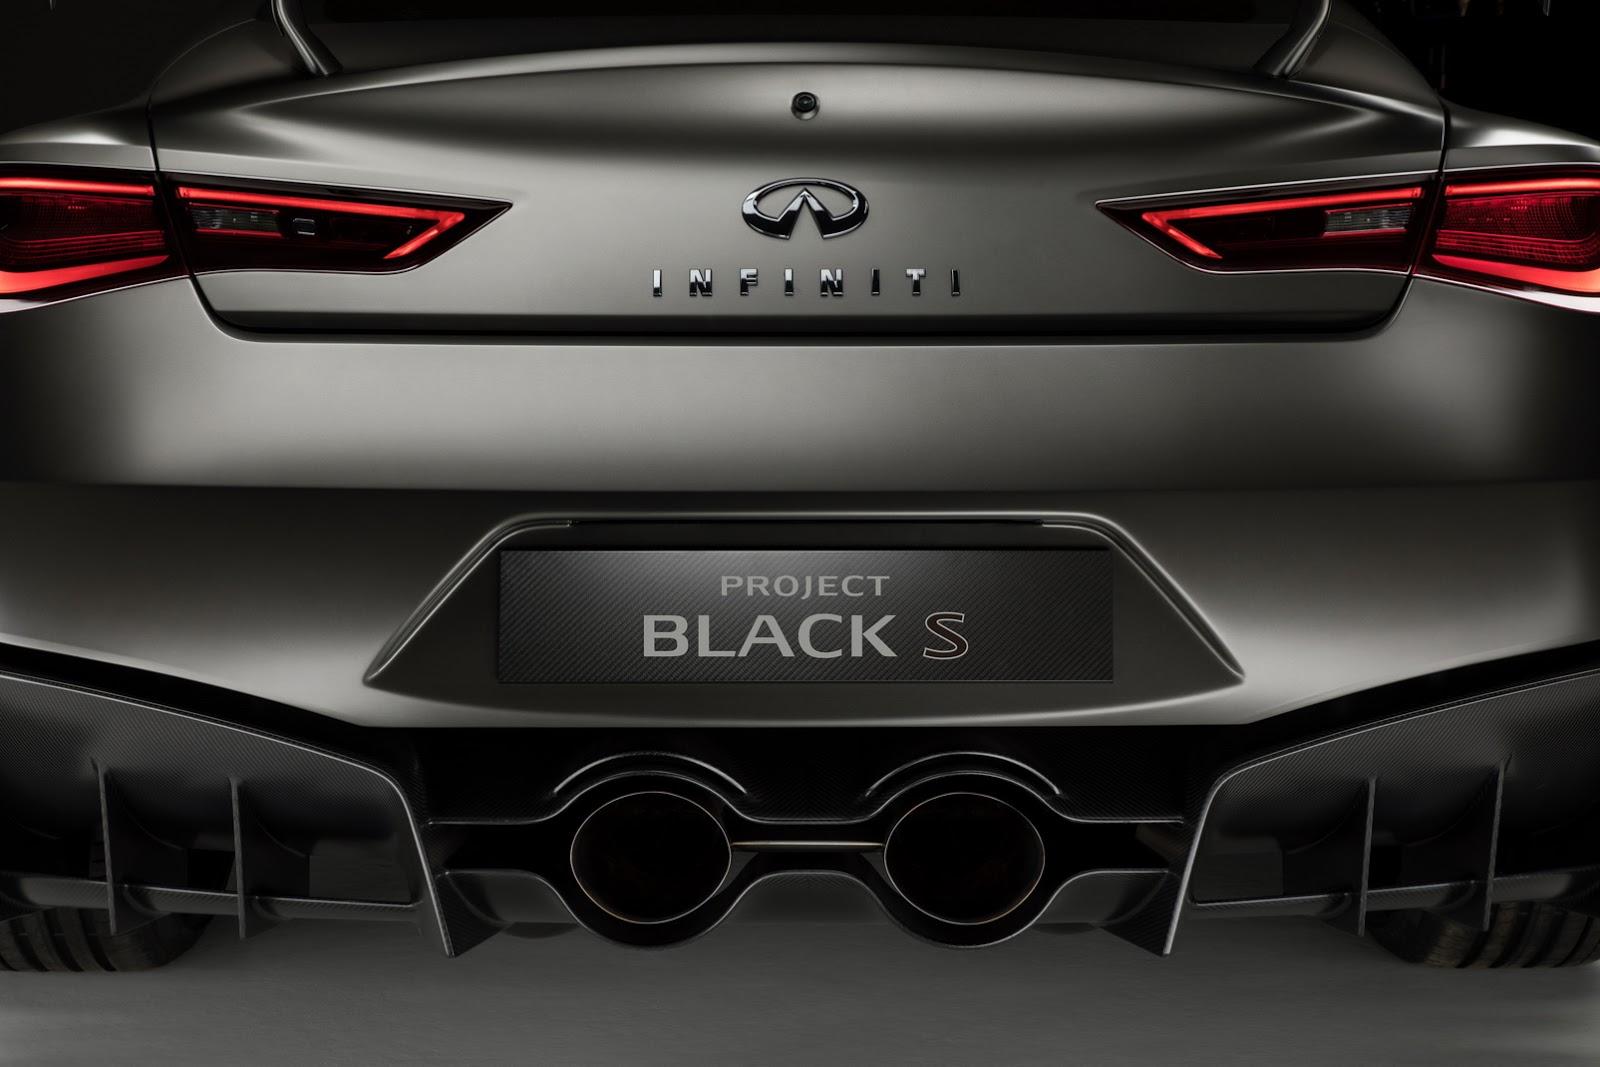 Infiniti Project Black S (27)